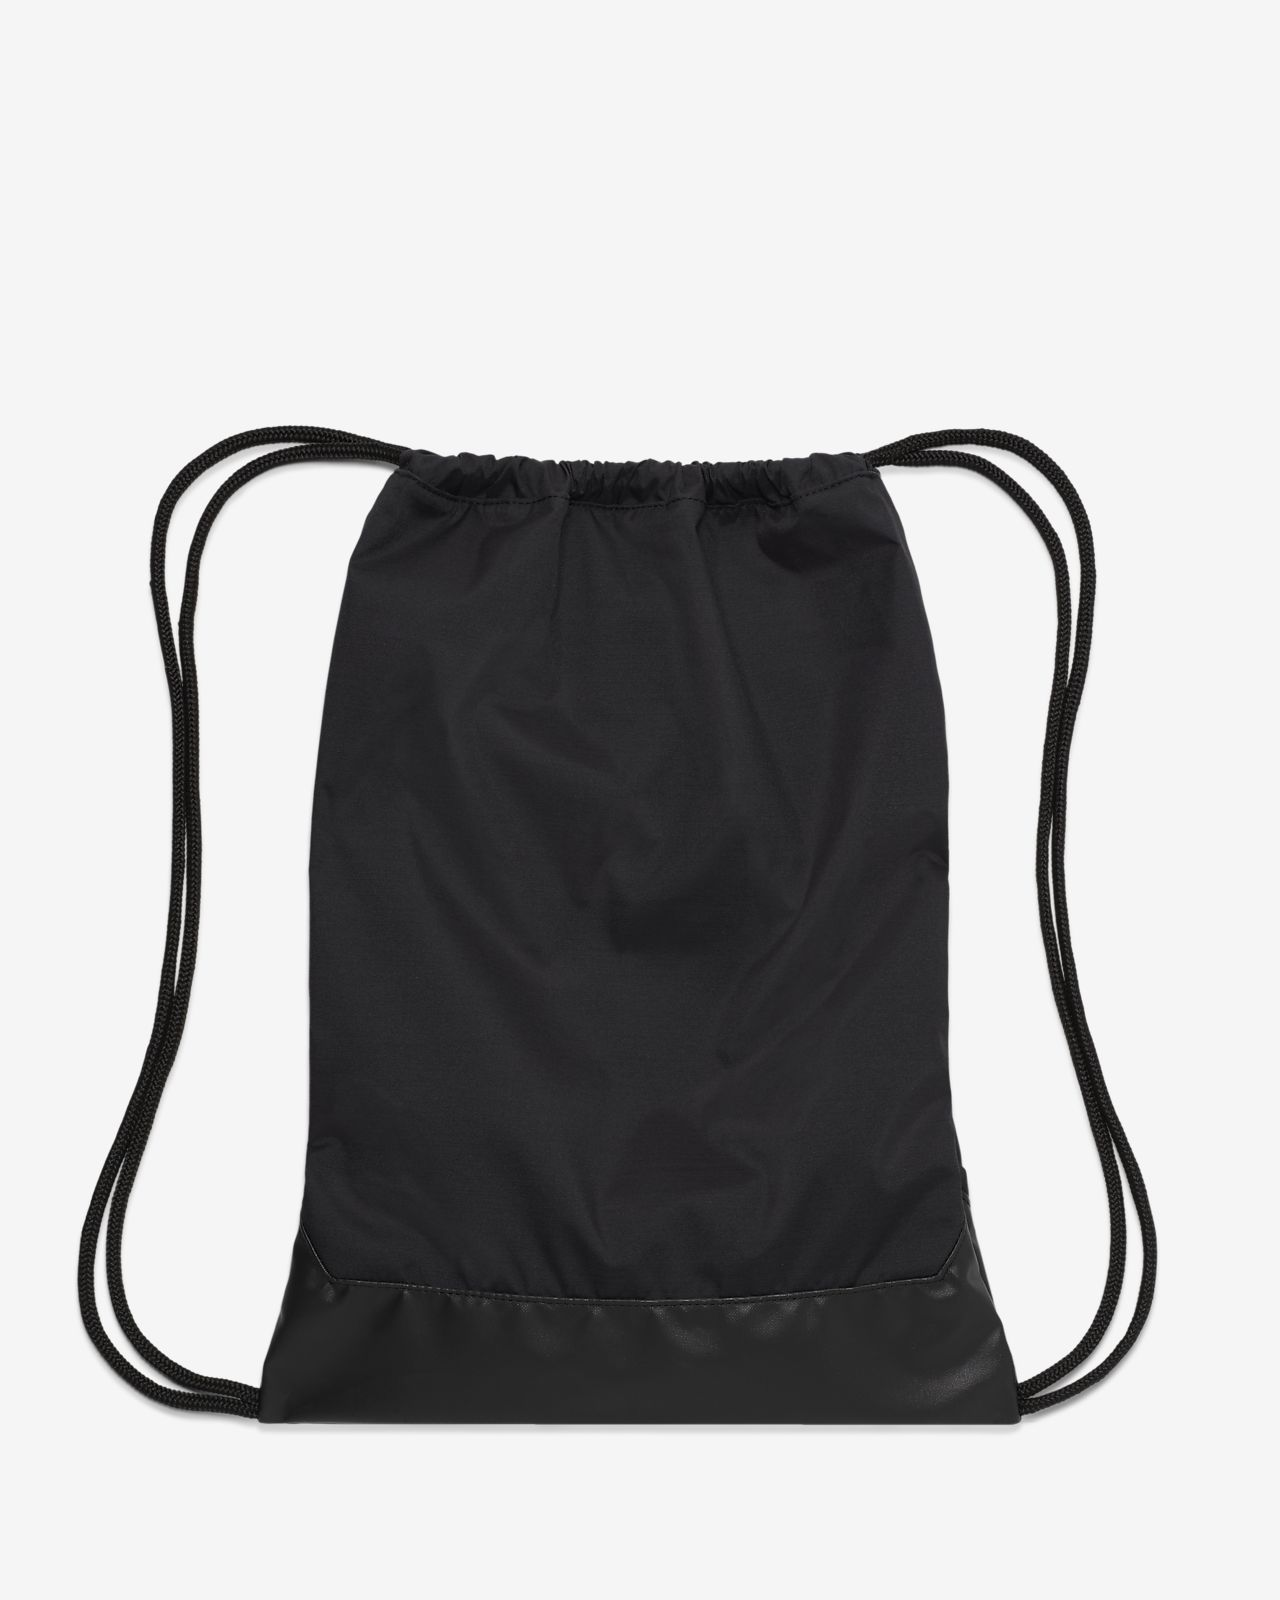 NIKE 'MERCURIAL' DRAWSTRING BAG NEW NEVER USED